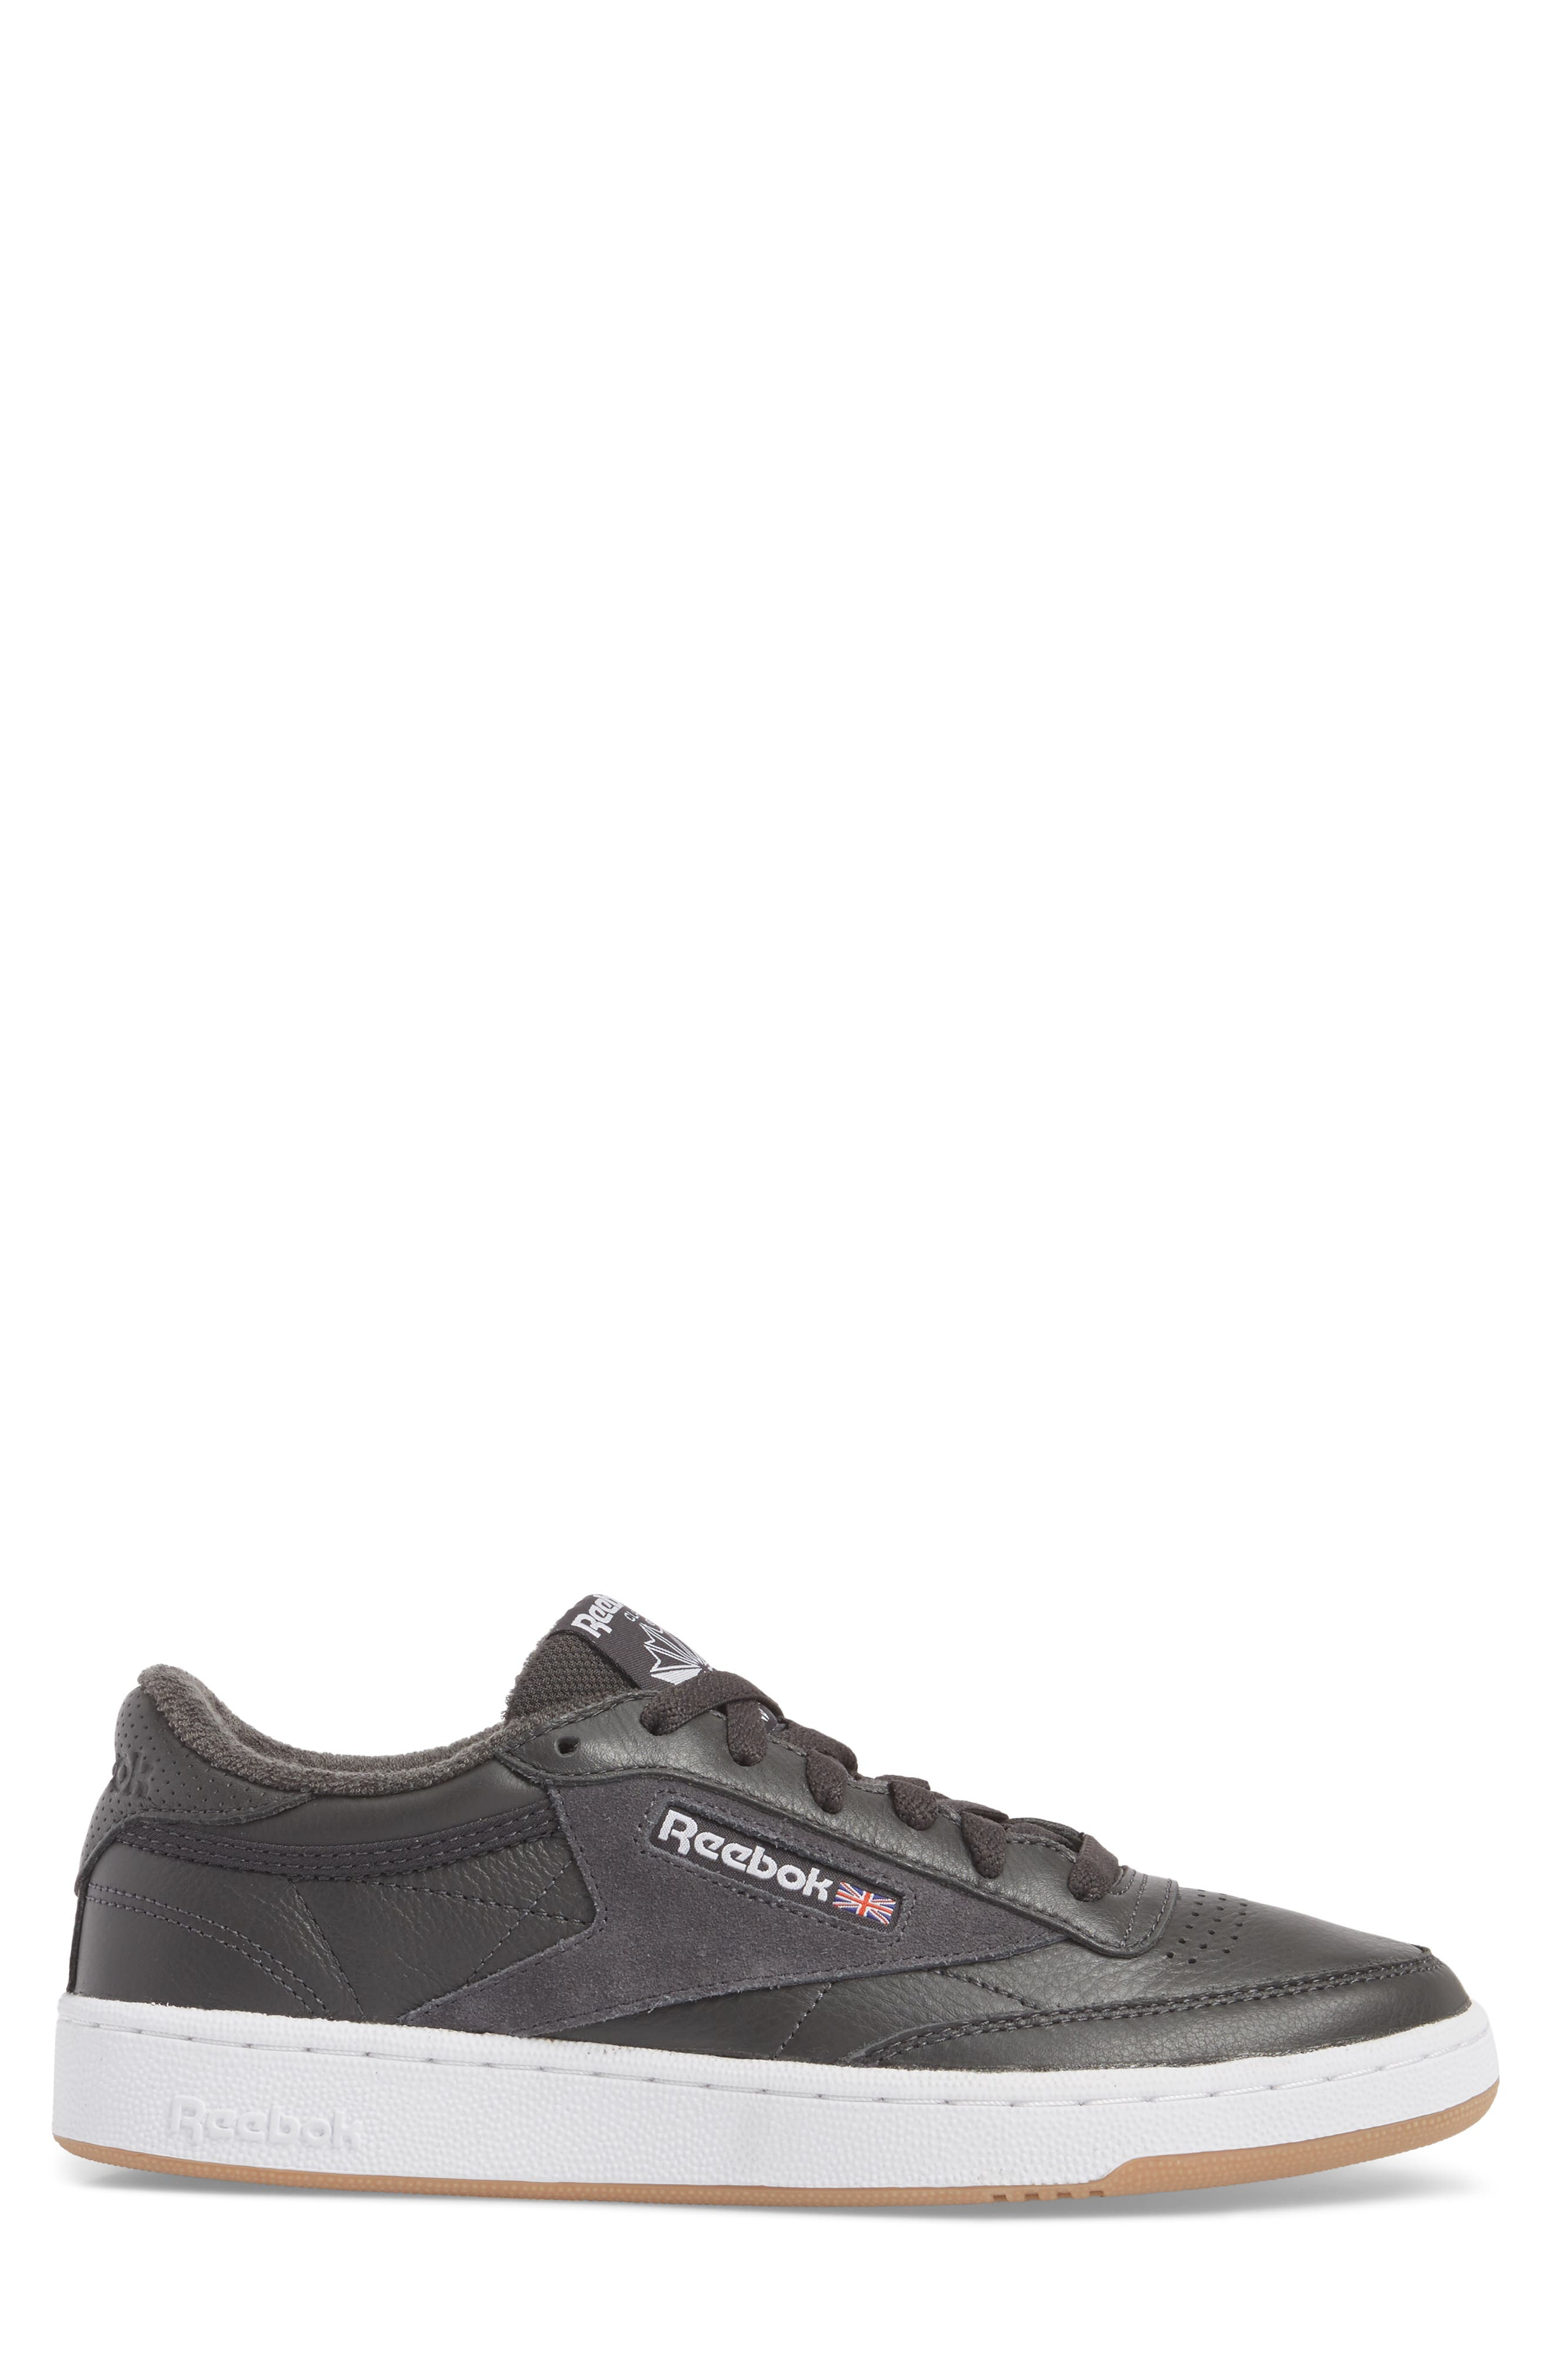 Club C 85 ESTL Sneaker,                             Alternate thumbnail 3, color,                             001